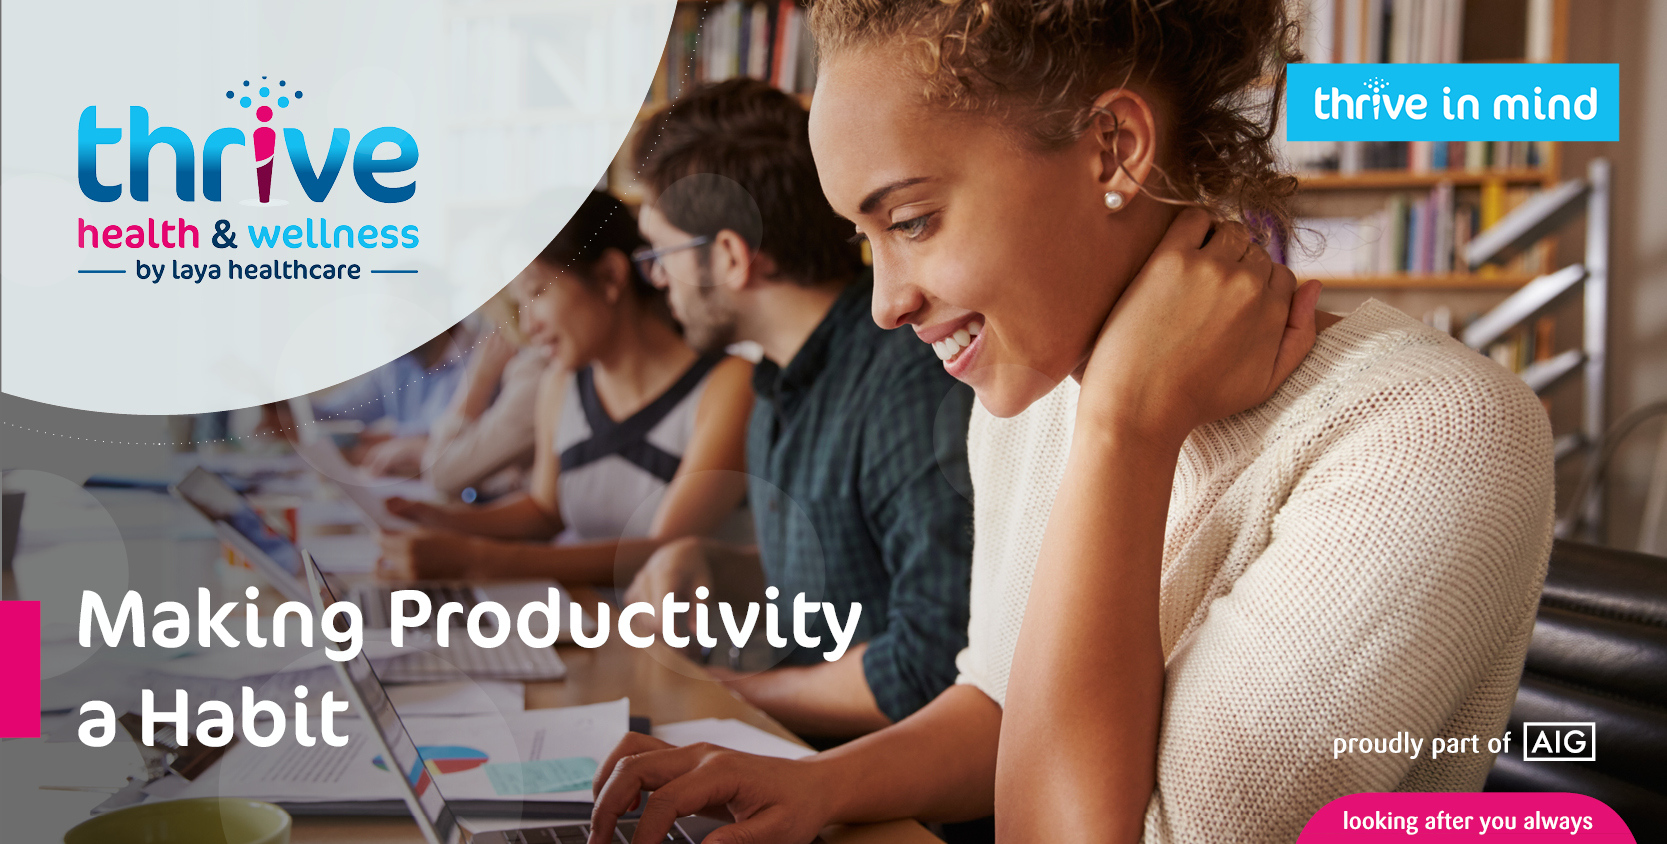 MAILCHIMP TEMPLATE. Making Productivity a Habit.jpg